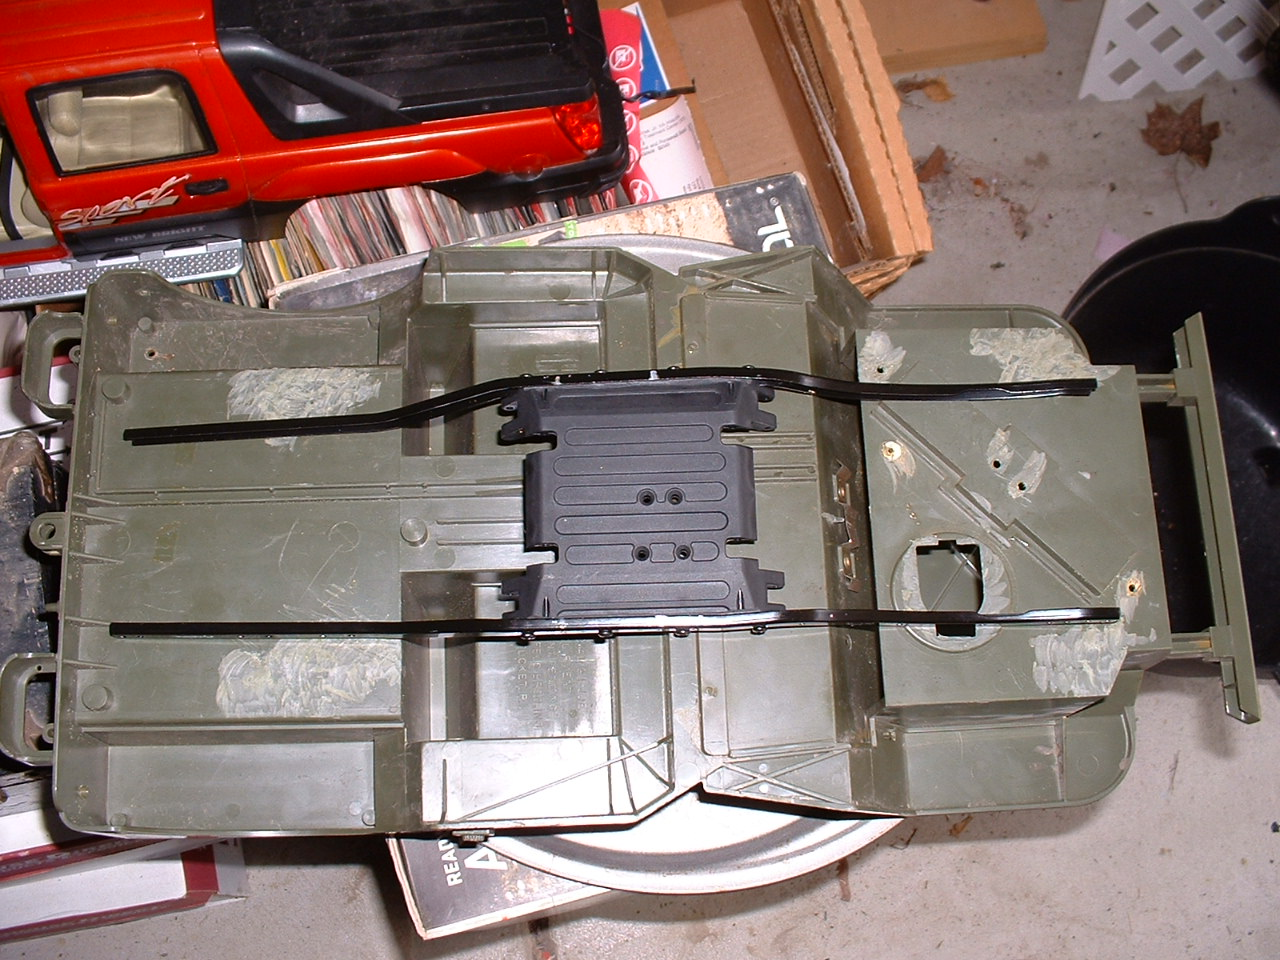 Click image for larger version  Name:G.I. Joe Jeep 004.JPG Views:2561 Size:324.4 KB ID:2037577